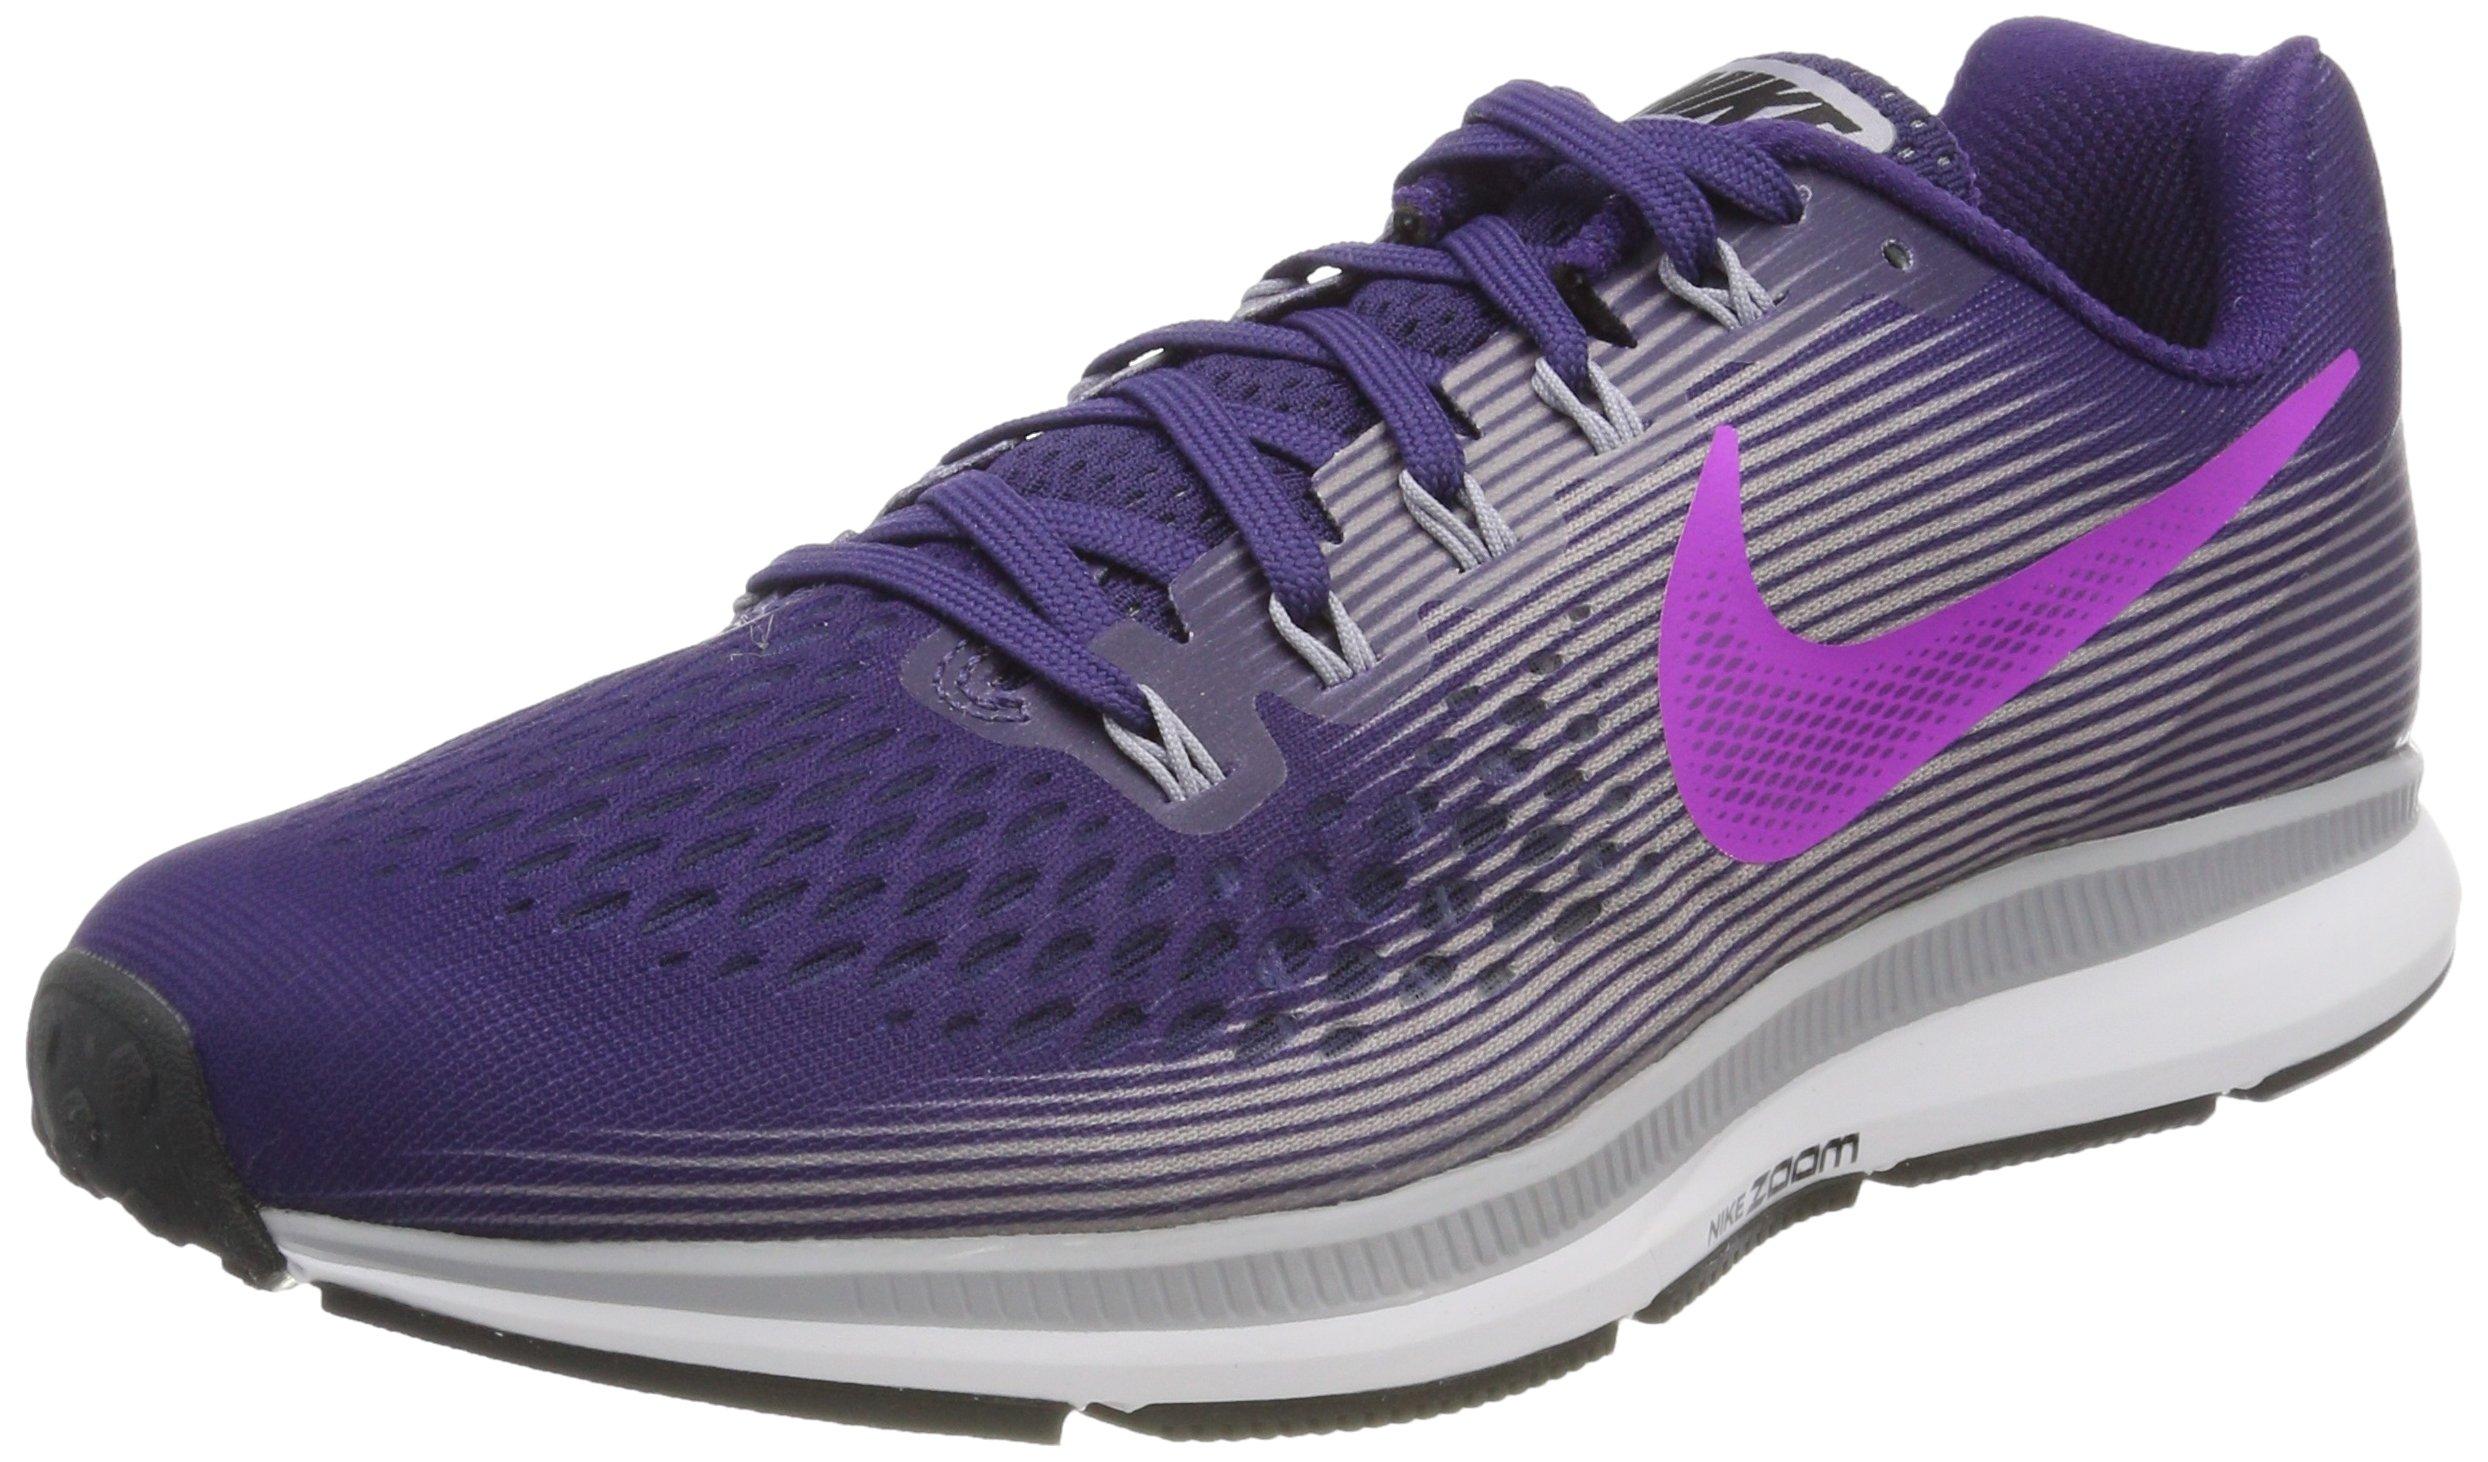 860694c8d56e Galleon - NIKE Women s Air Zoom Pegasus 34 Running Shoe Purple (10)